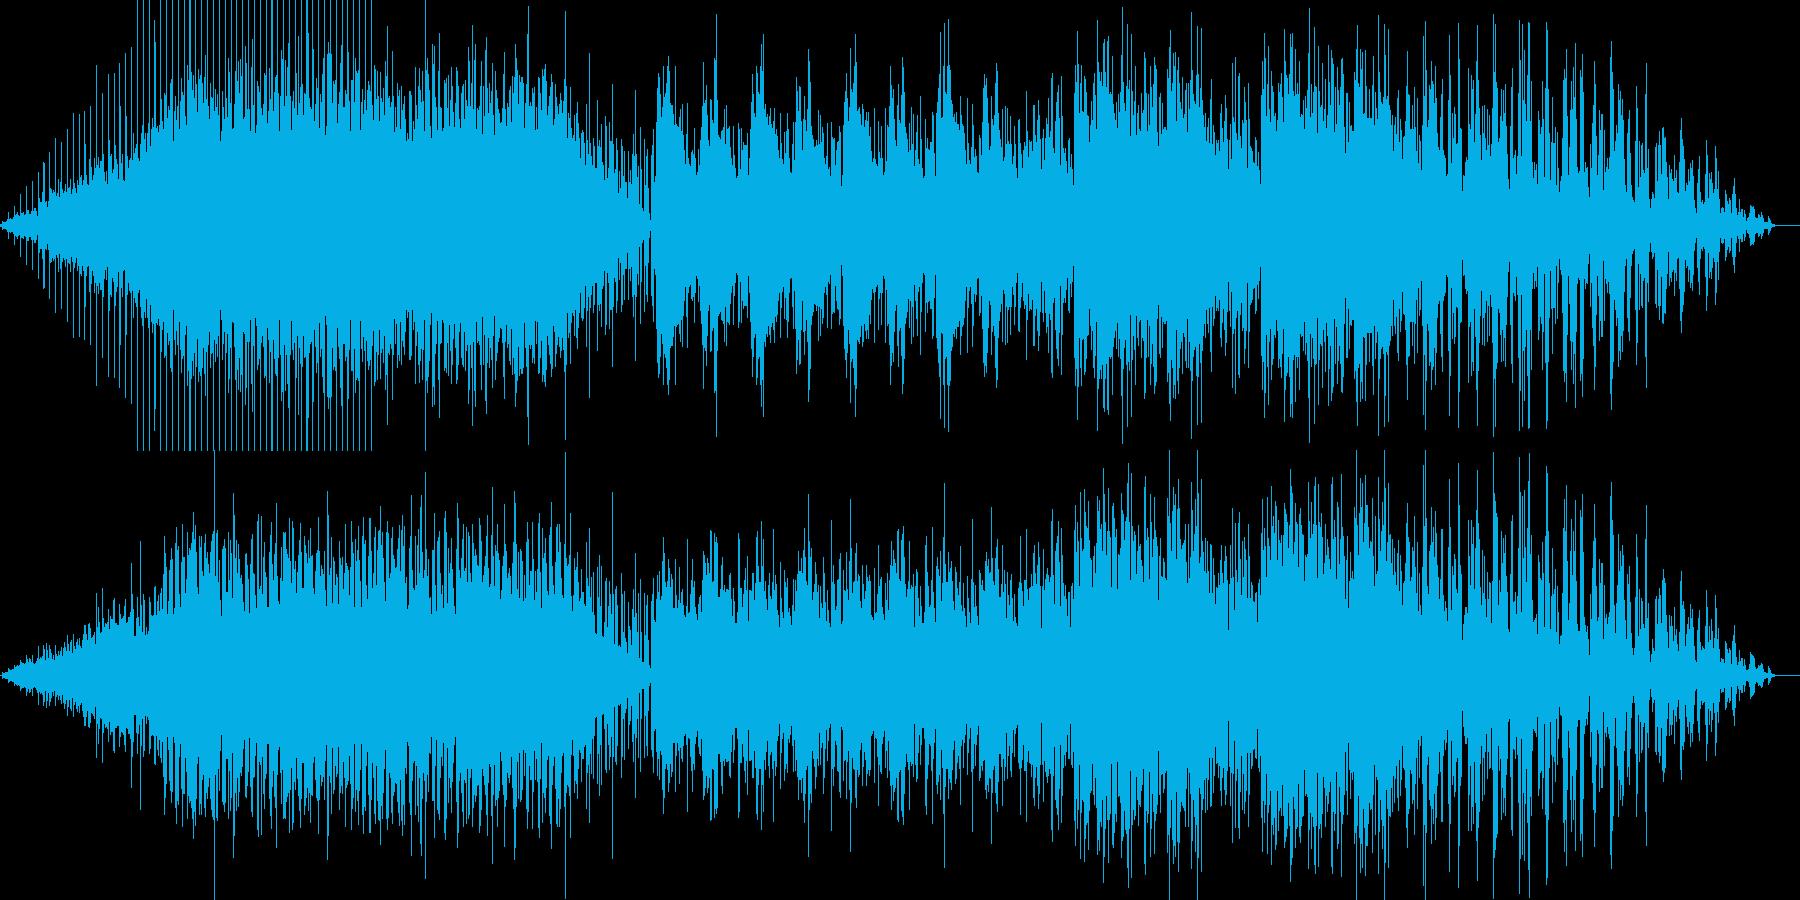 IDM風、グリッチなテクノの再生済みの波形